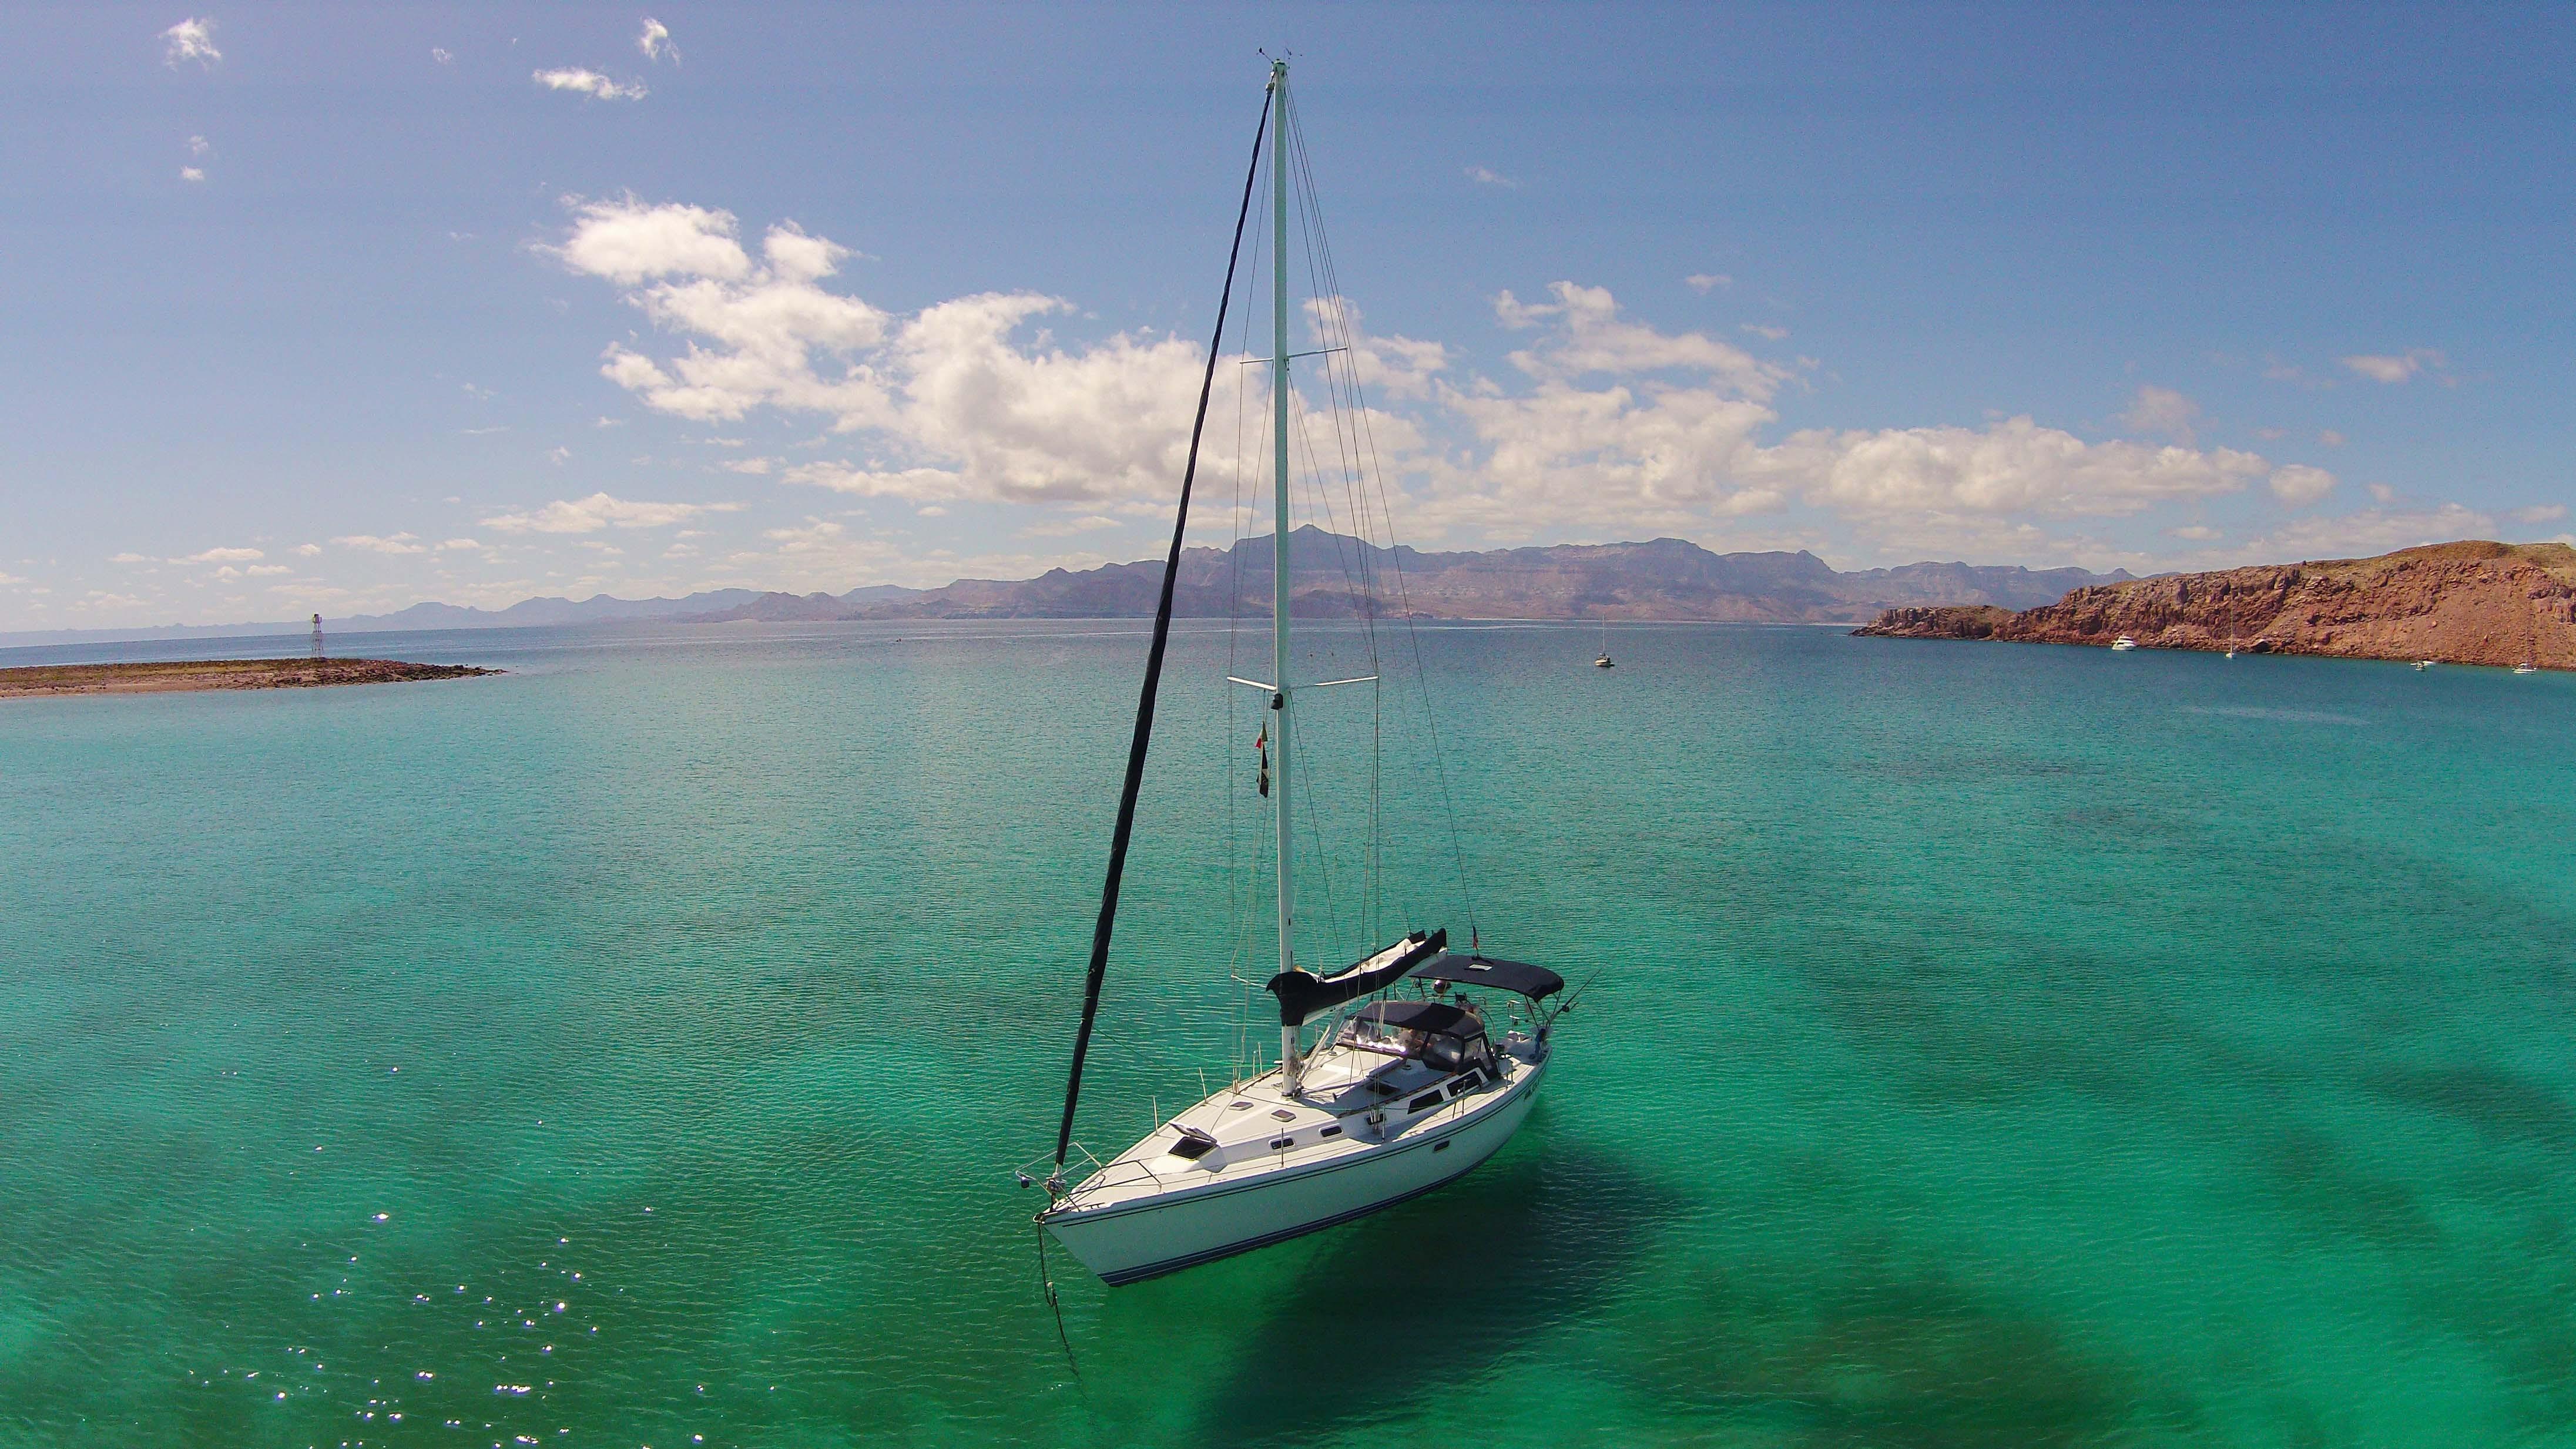 42' Catalina MKI 42-3+Boat for sale!